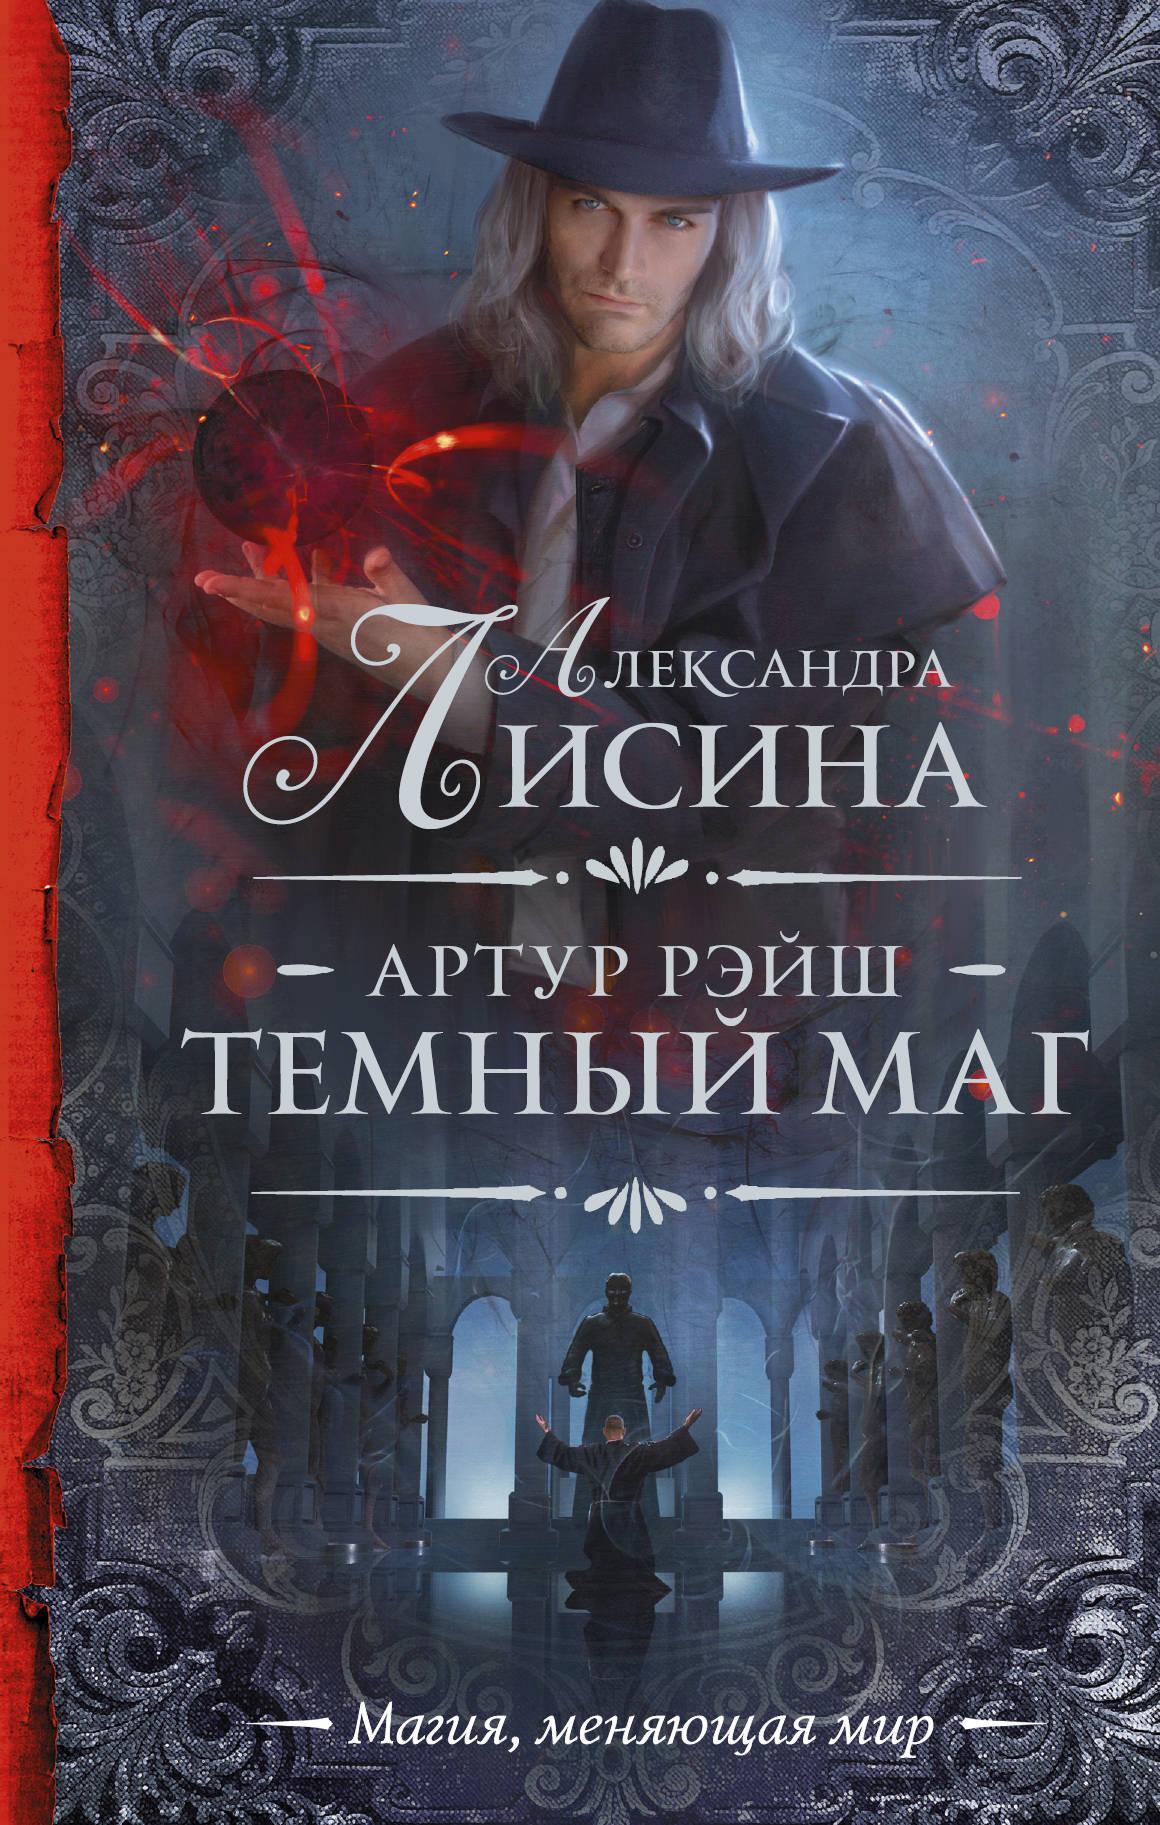 «Артур Рэйш. Темный маг (сборник)» Александра Лисина